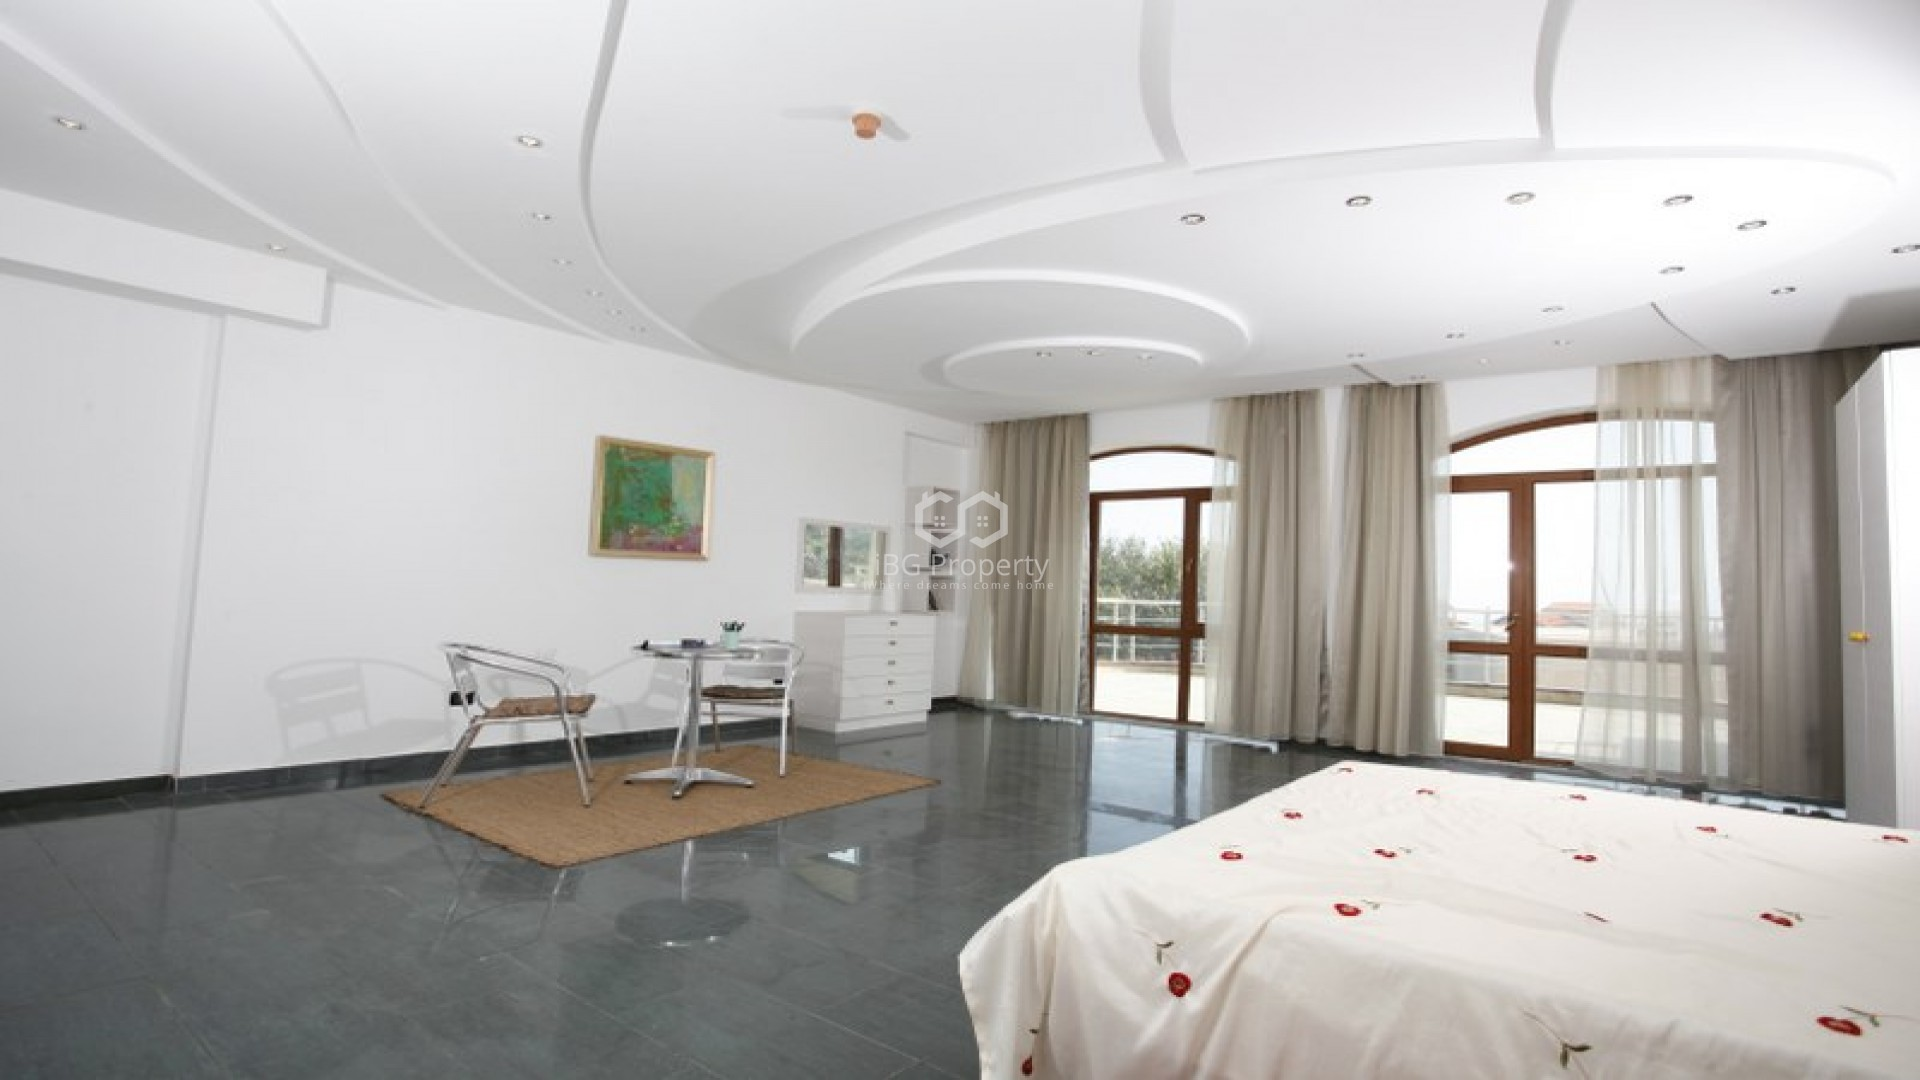 ЭКСКЛЮЗИВНОЕ ПРЕДЛОЖЕНИЕ! Двухкомнатная квартира Бяла  91 m2